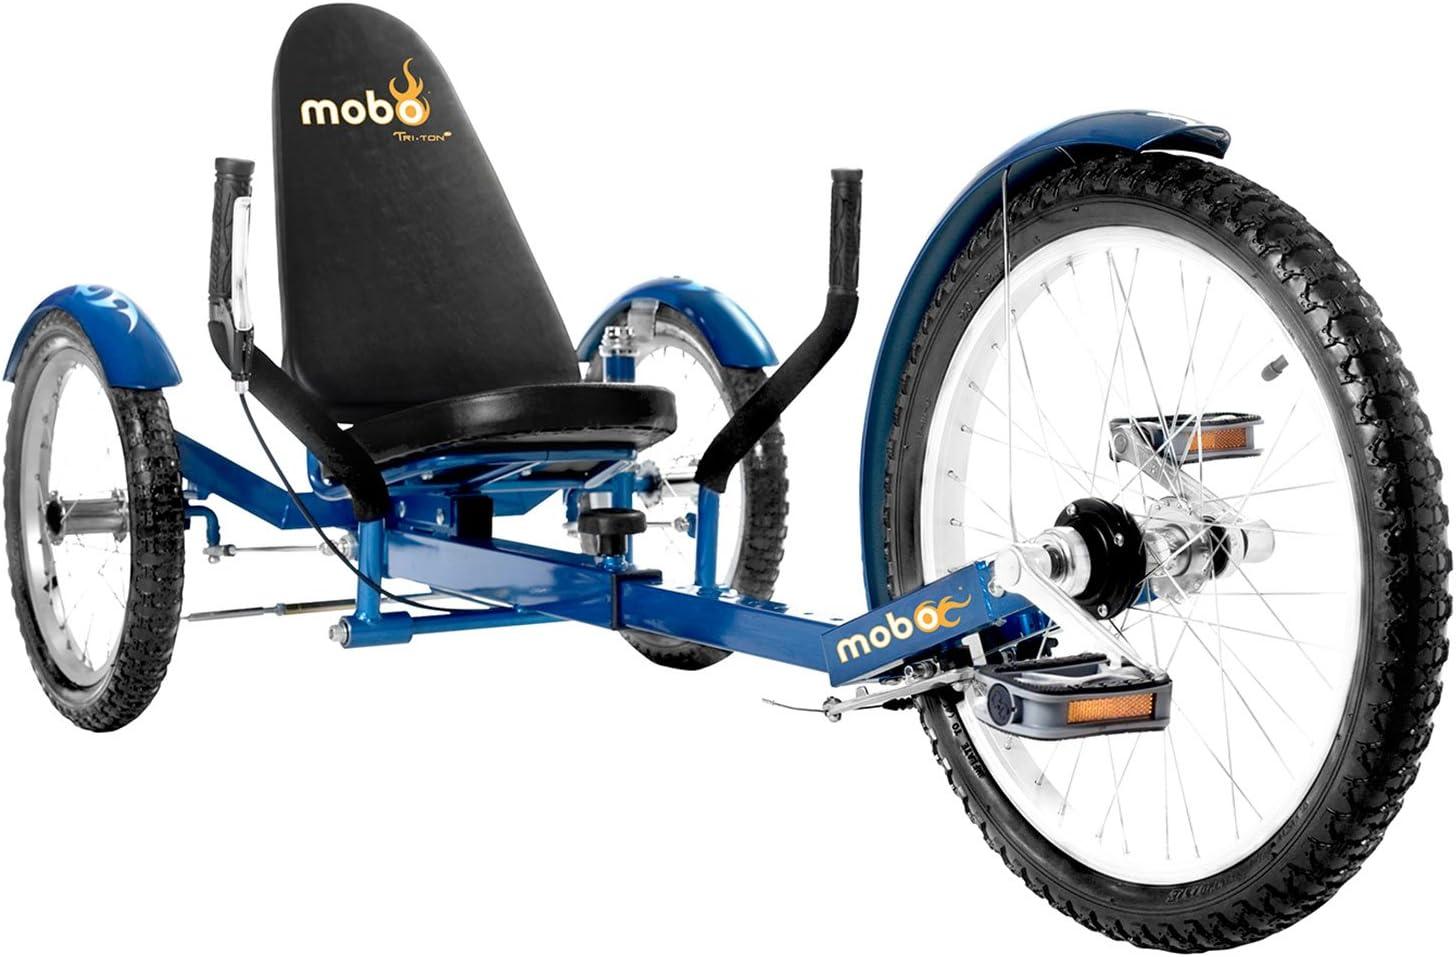 Mobo Triton Pro